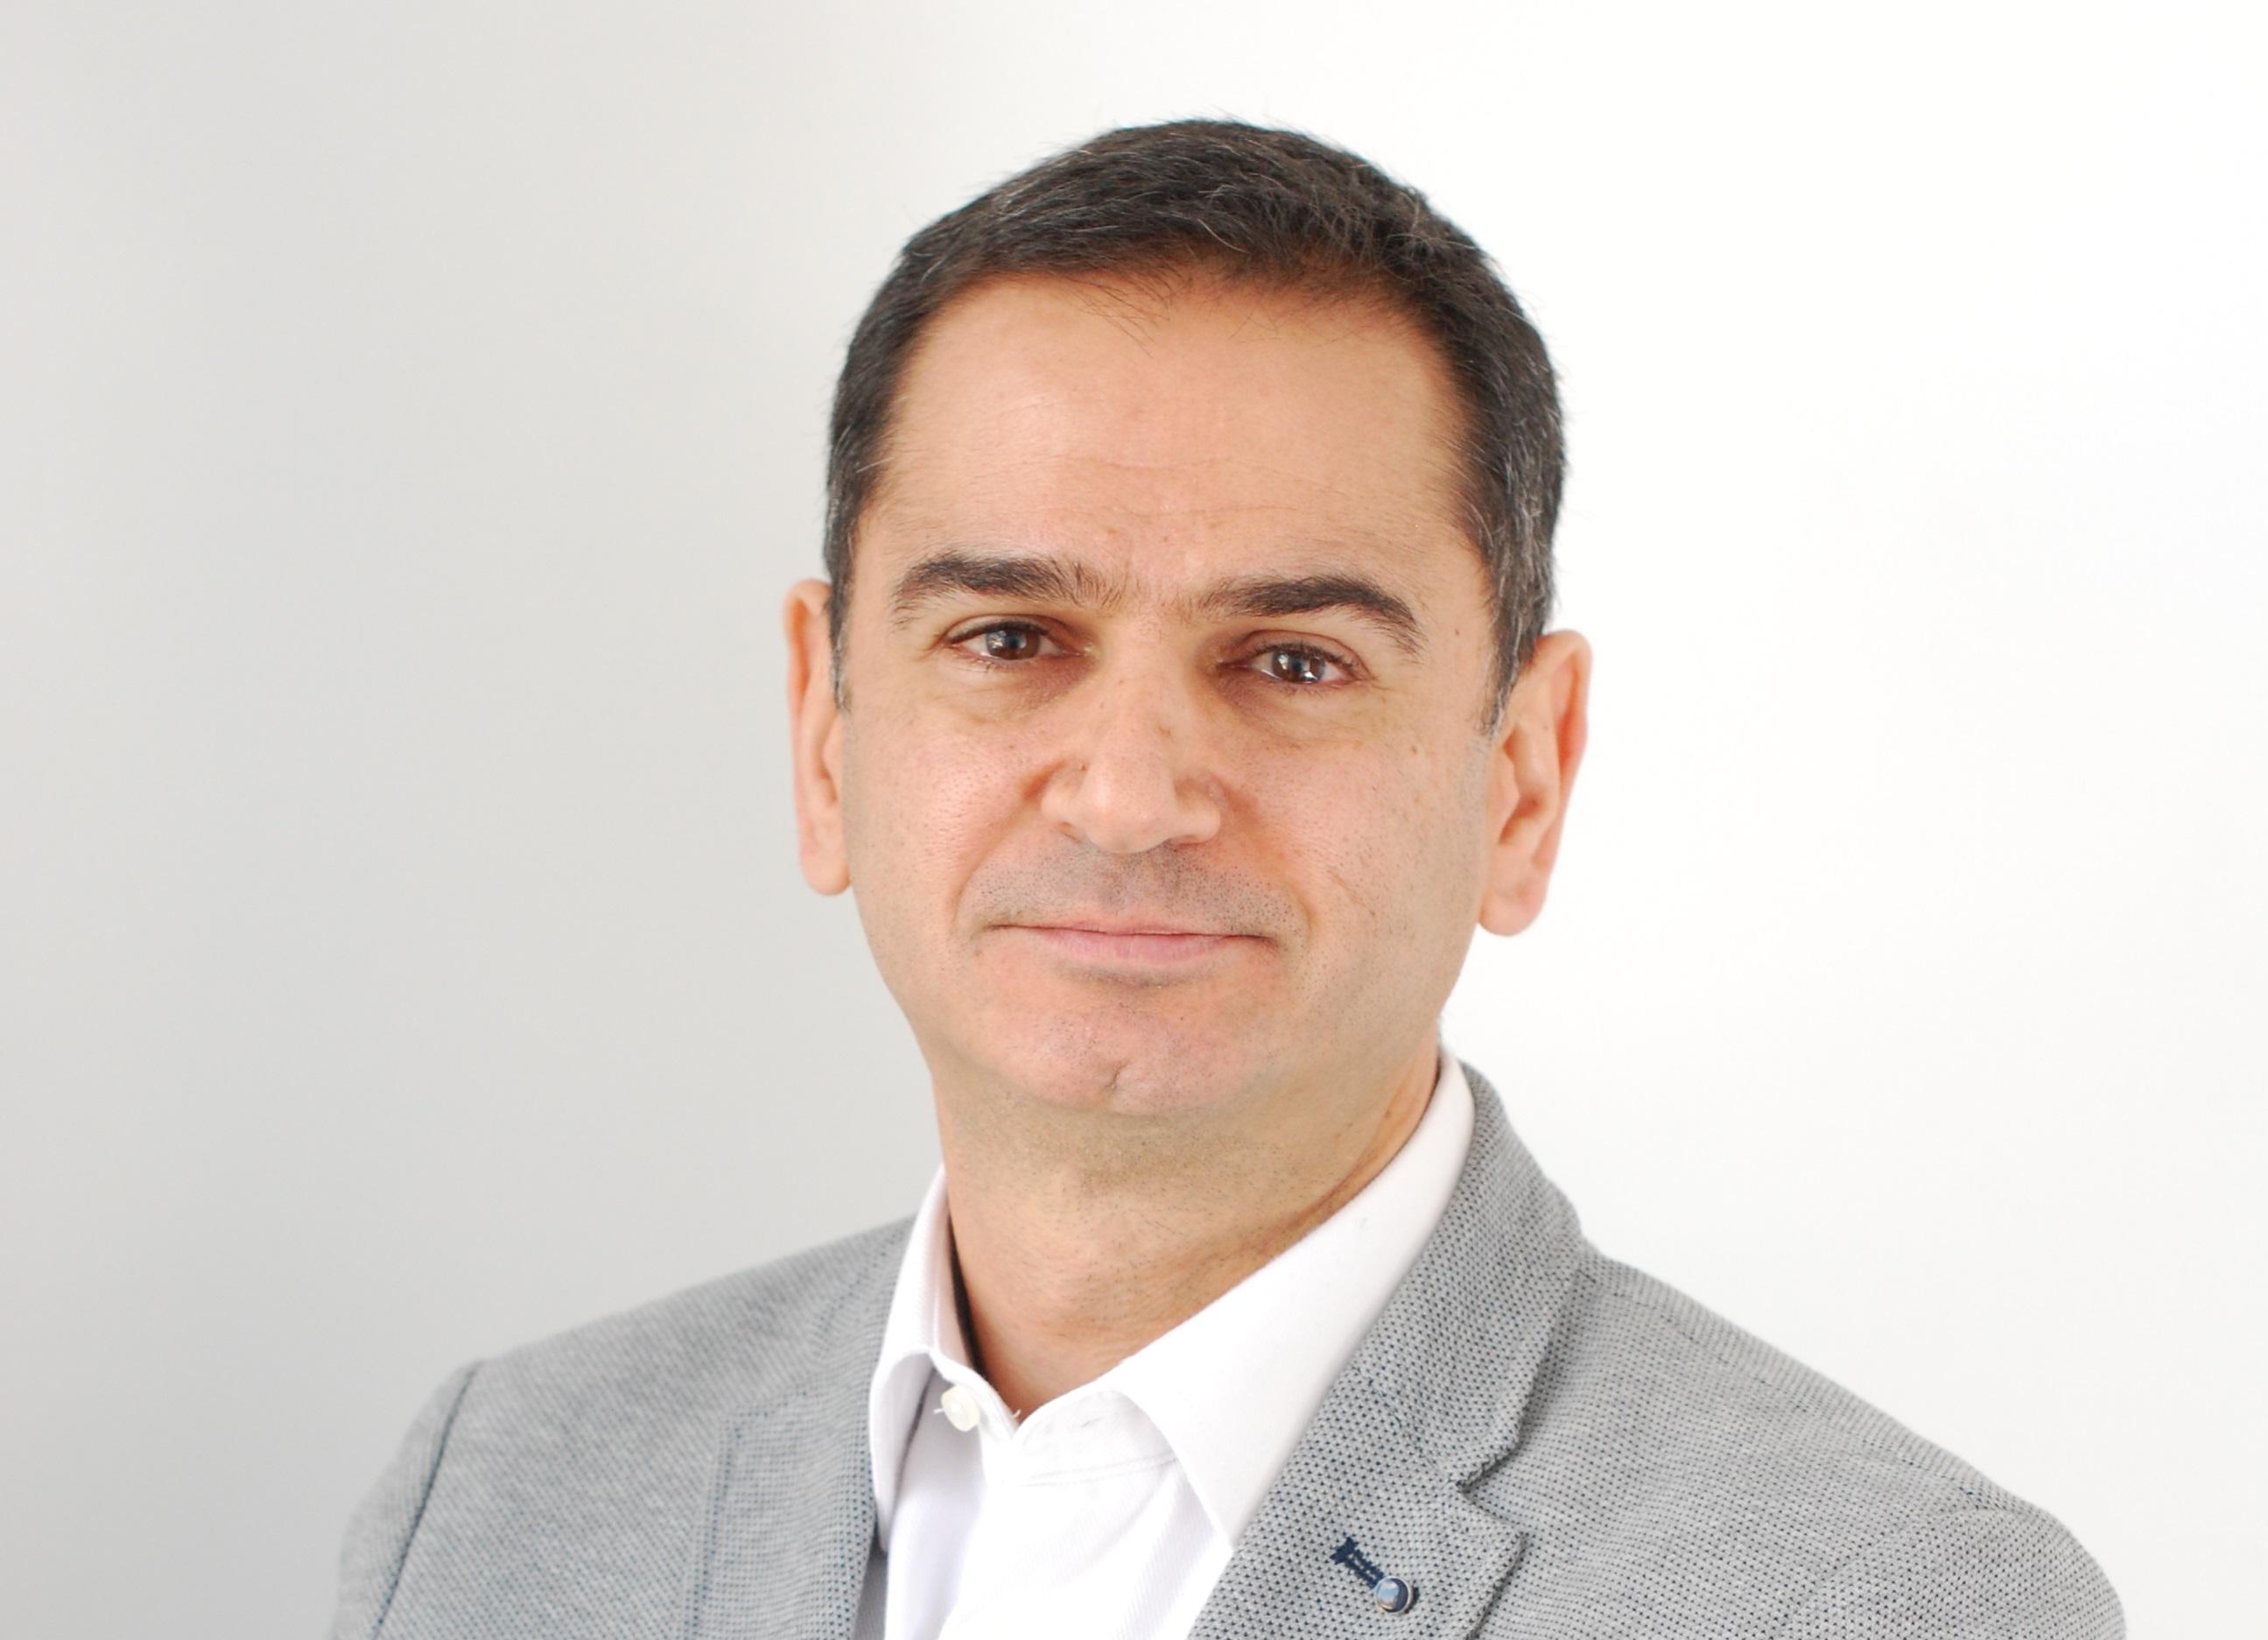 Elias Ghanem Capgemini - 2020 banking innovation: RBI readers give their expert forecasts